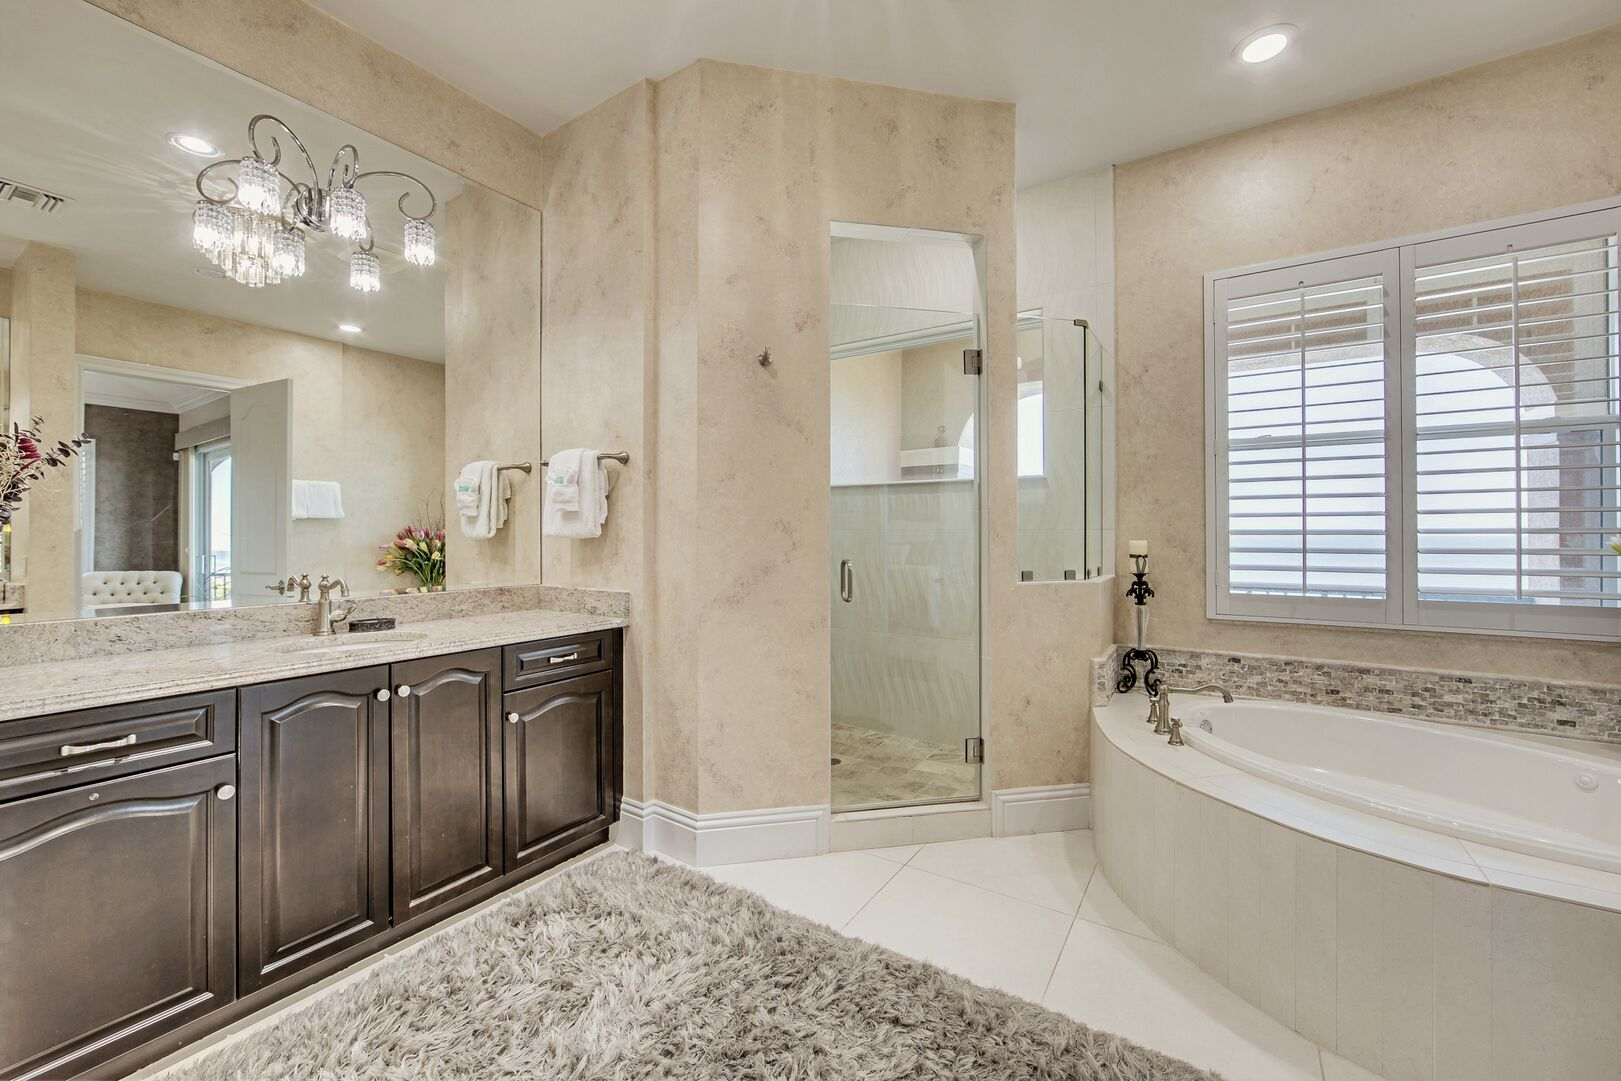 Bathroom with Shower, Bathtub, Single Vanity Sink, and Mirror.